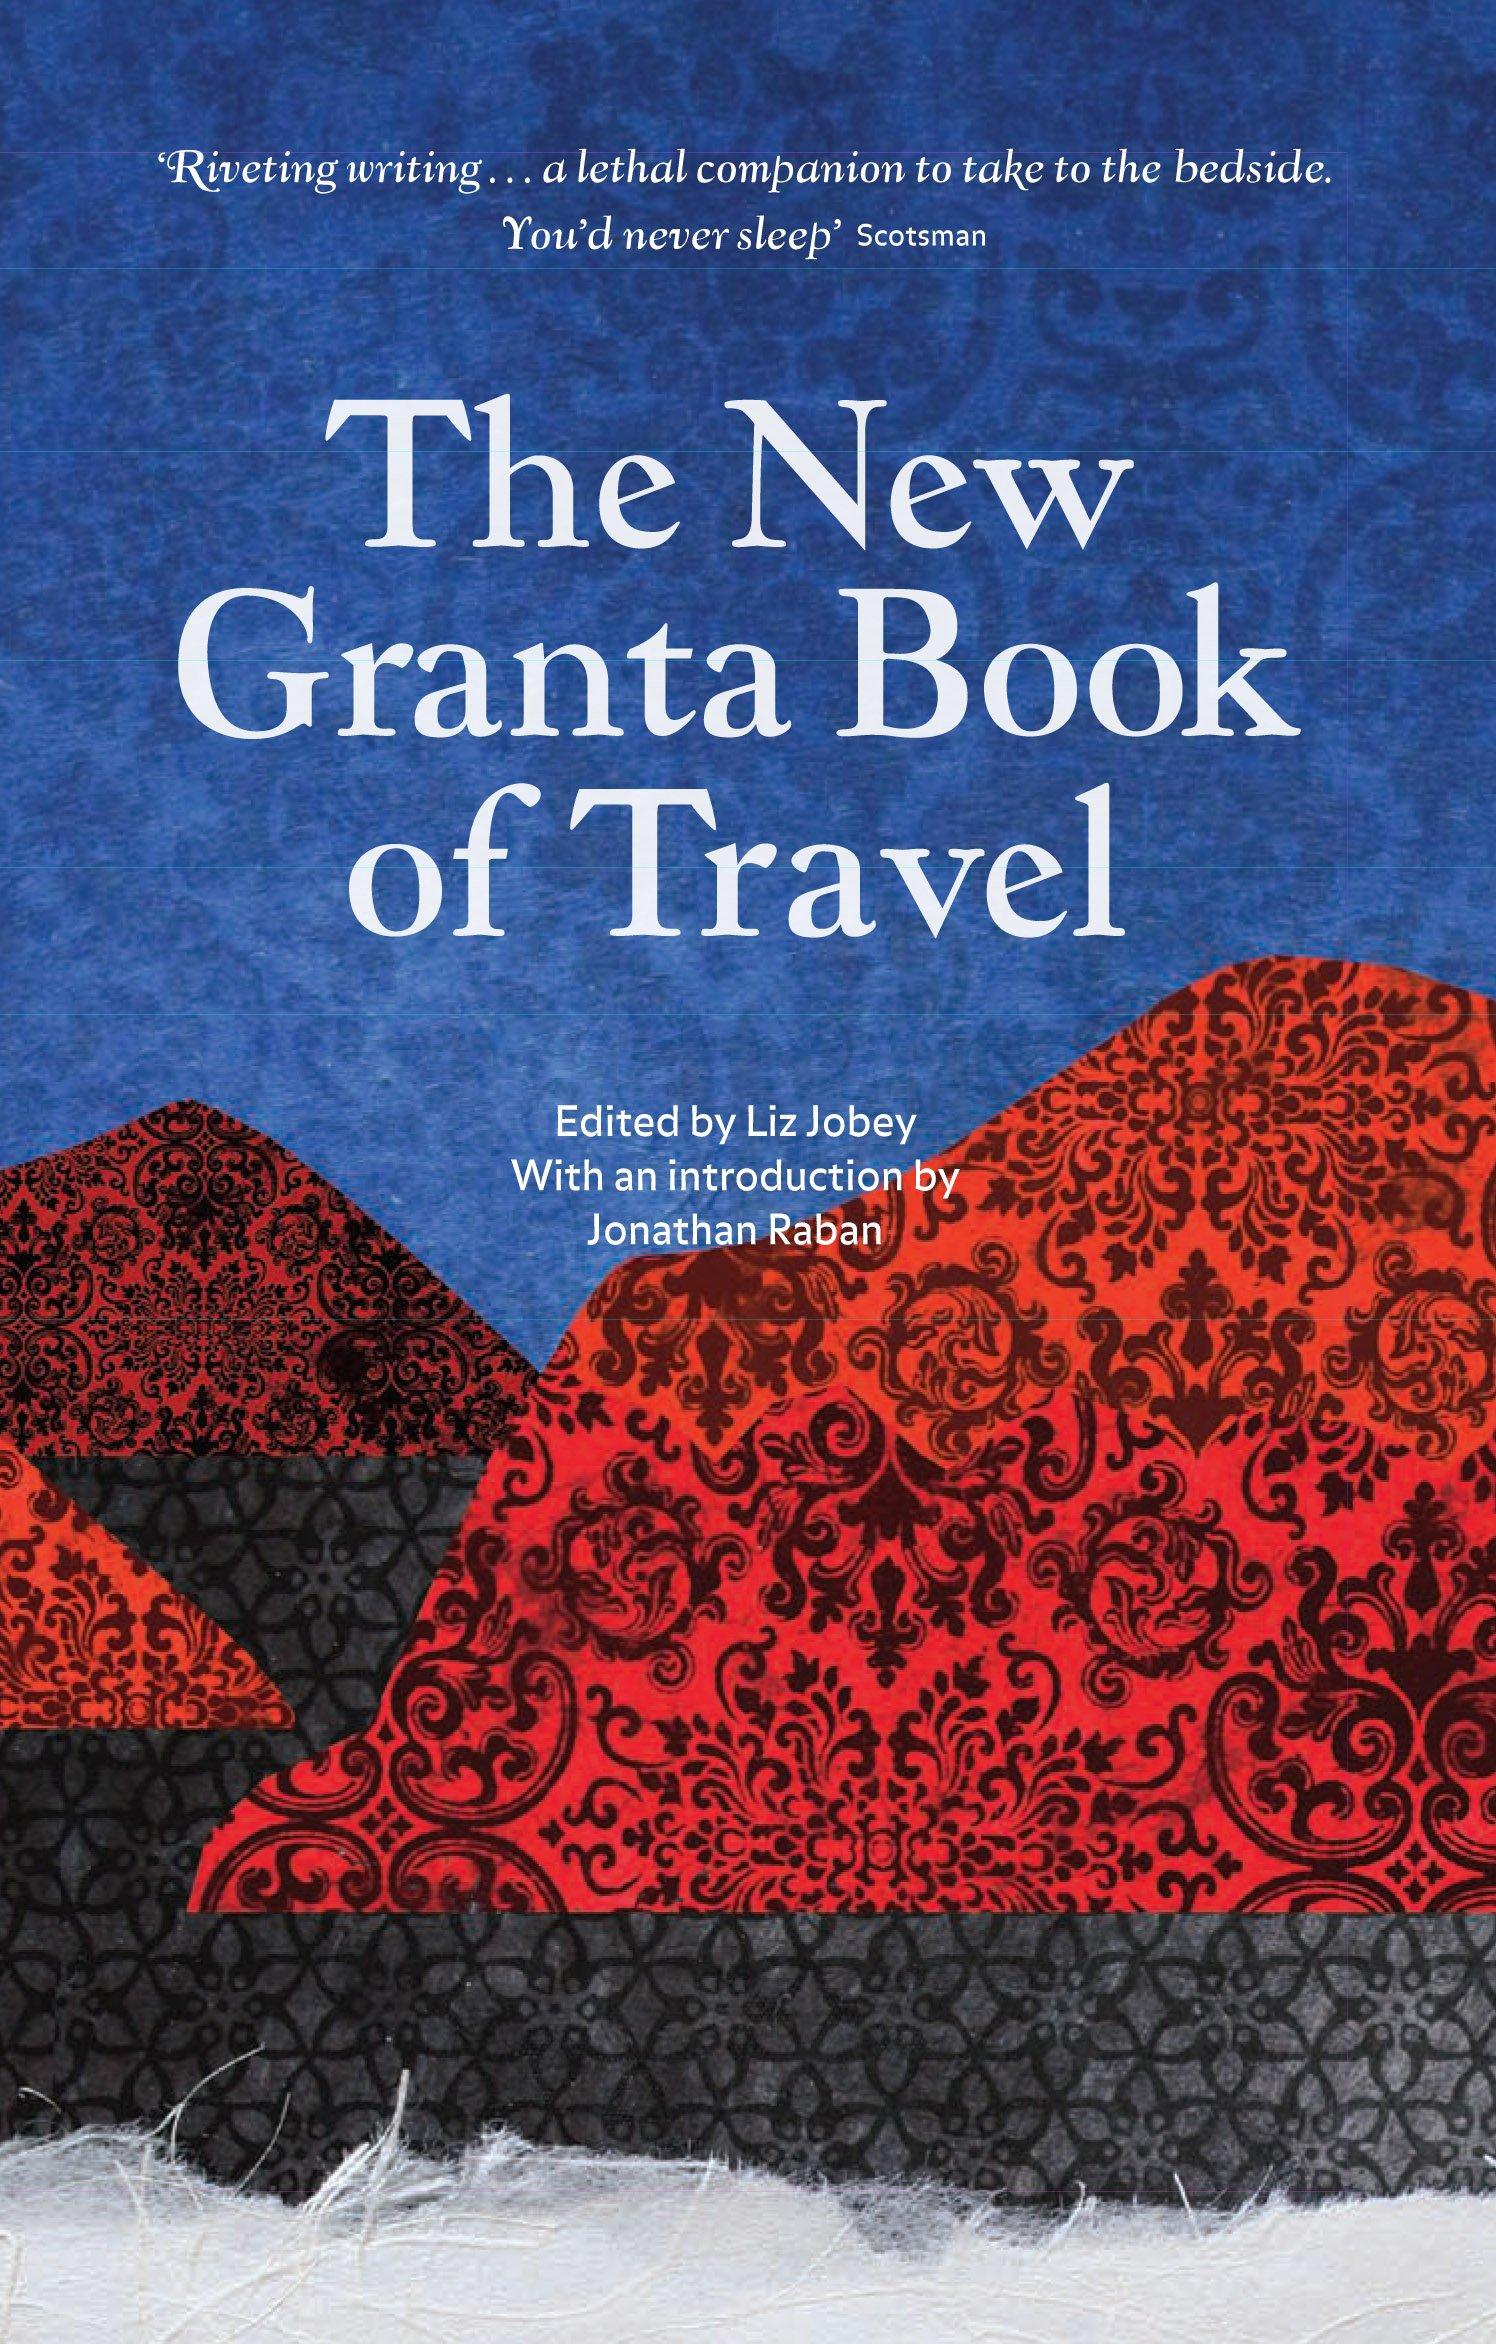 The New Granta Book of Travel ebook